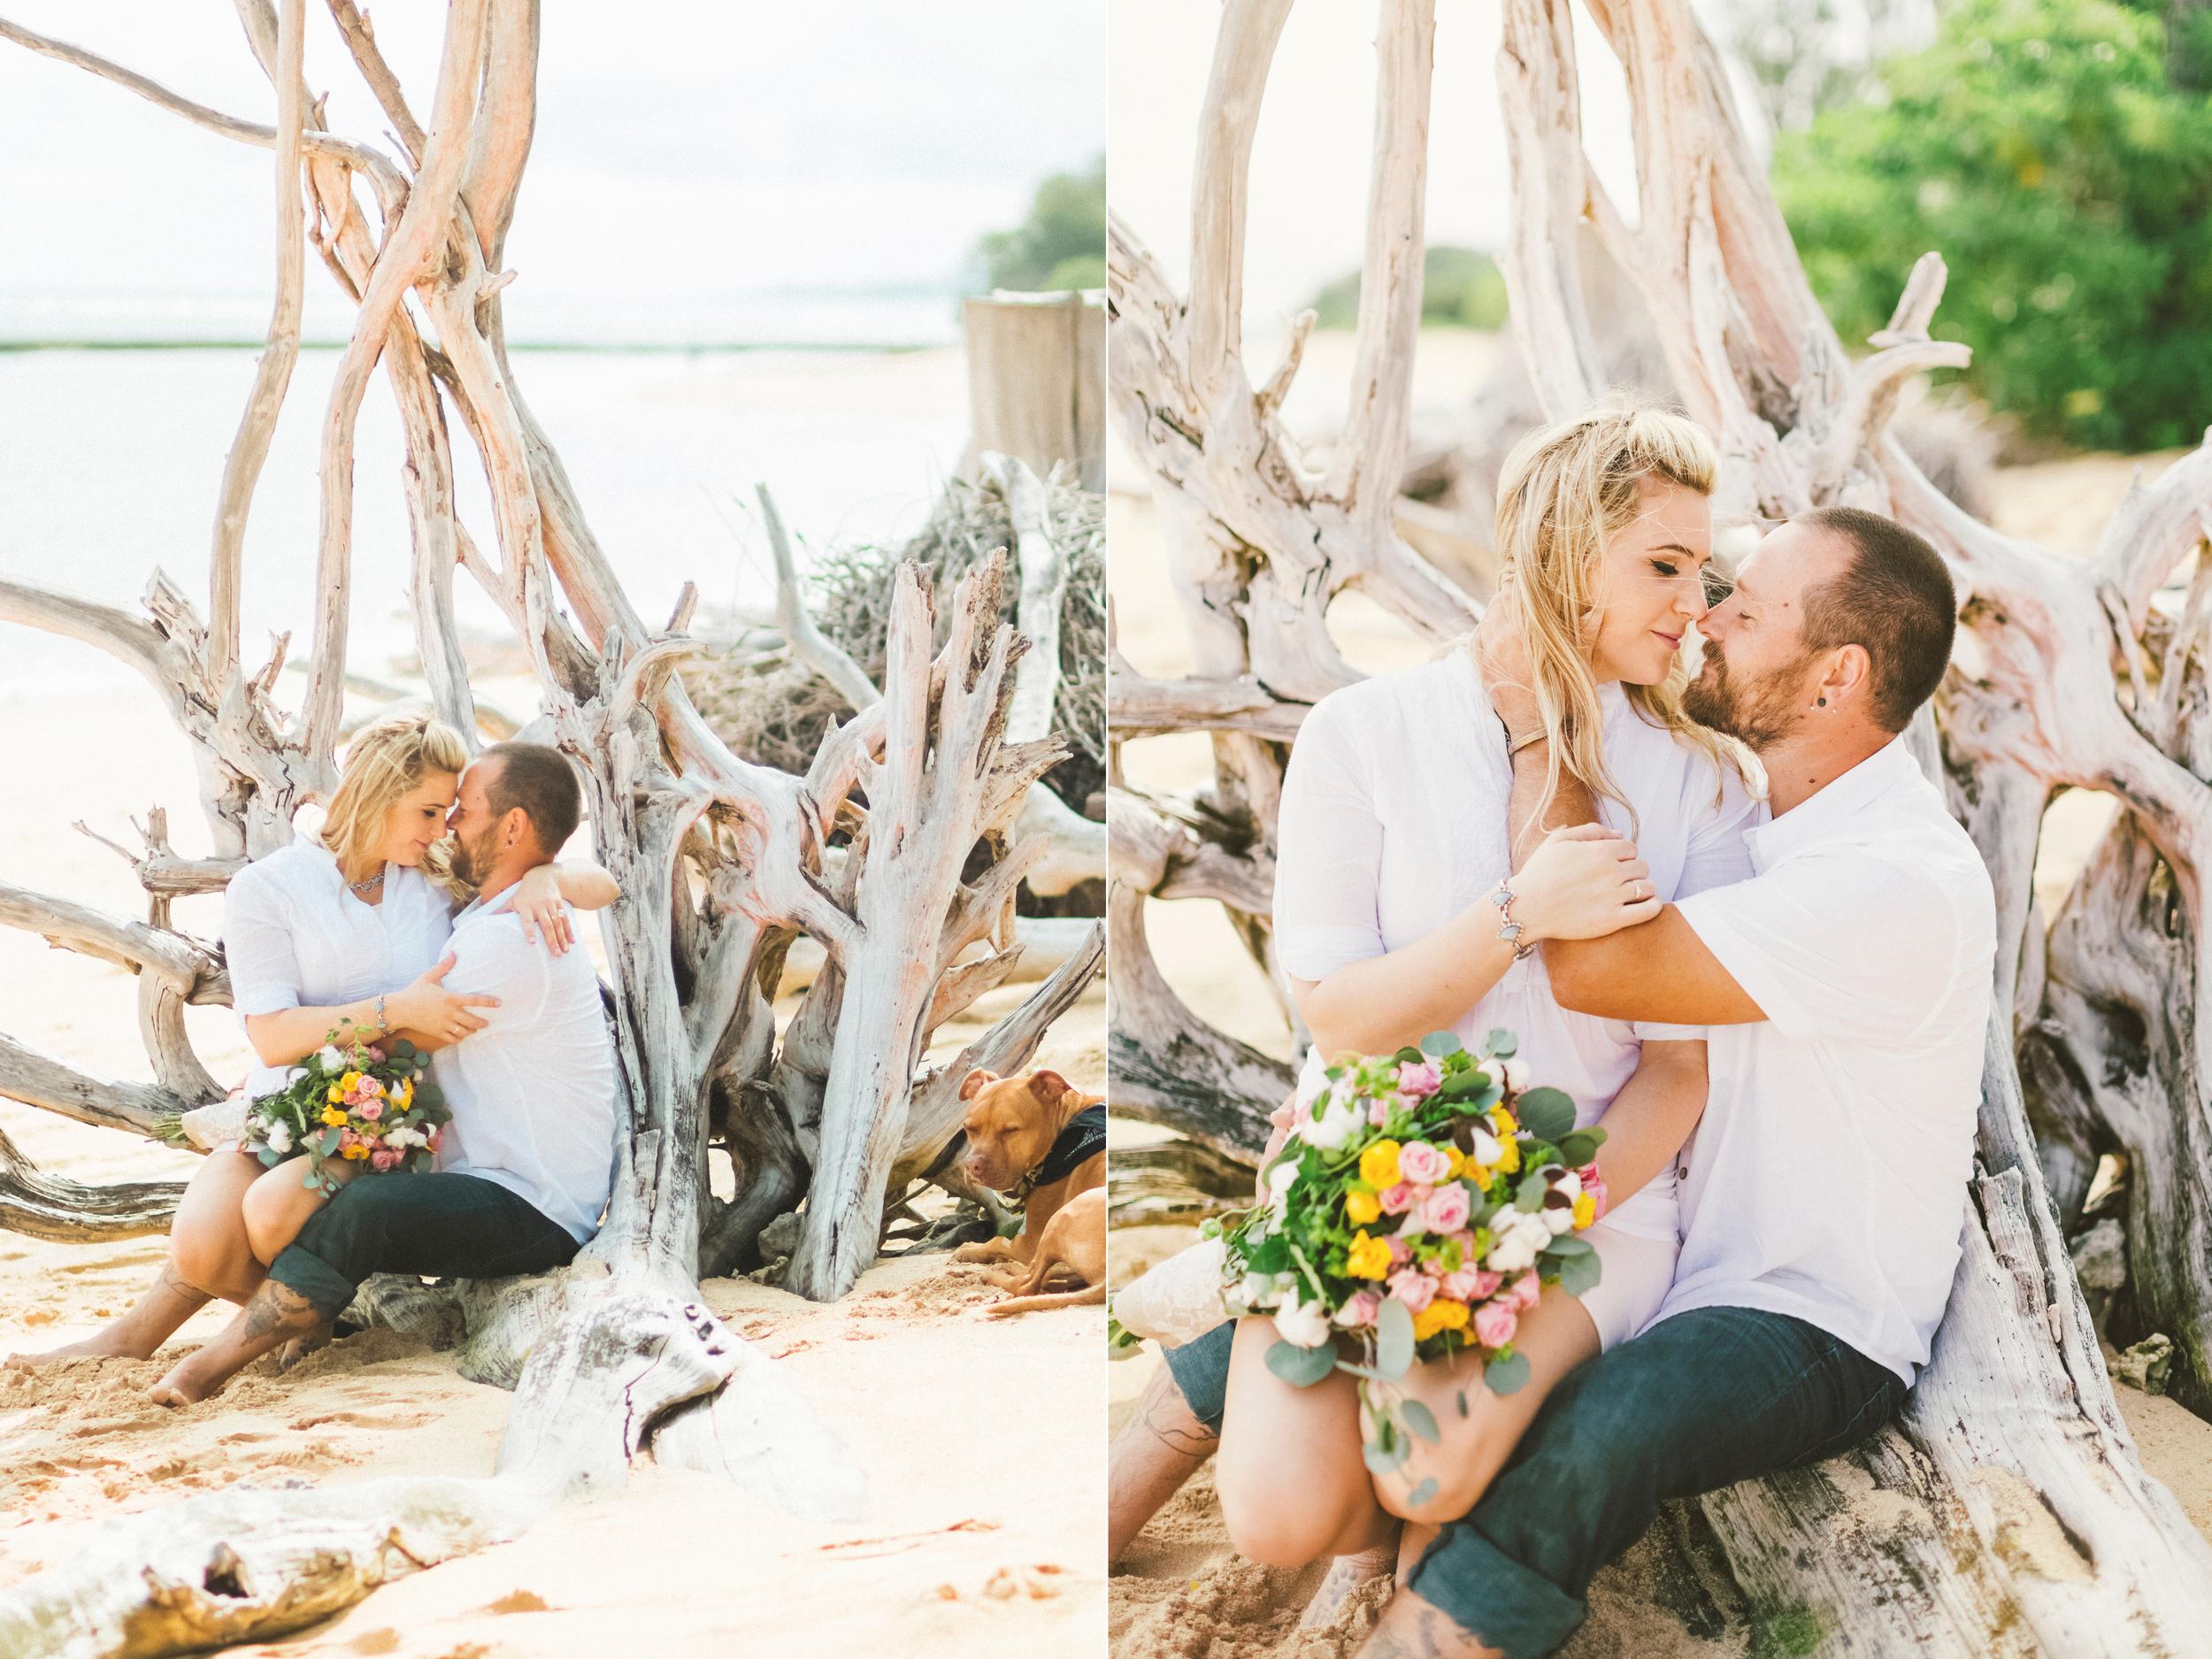 angie-diaz-photography-maui-wedding-4.jpg